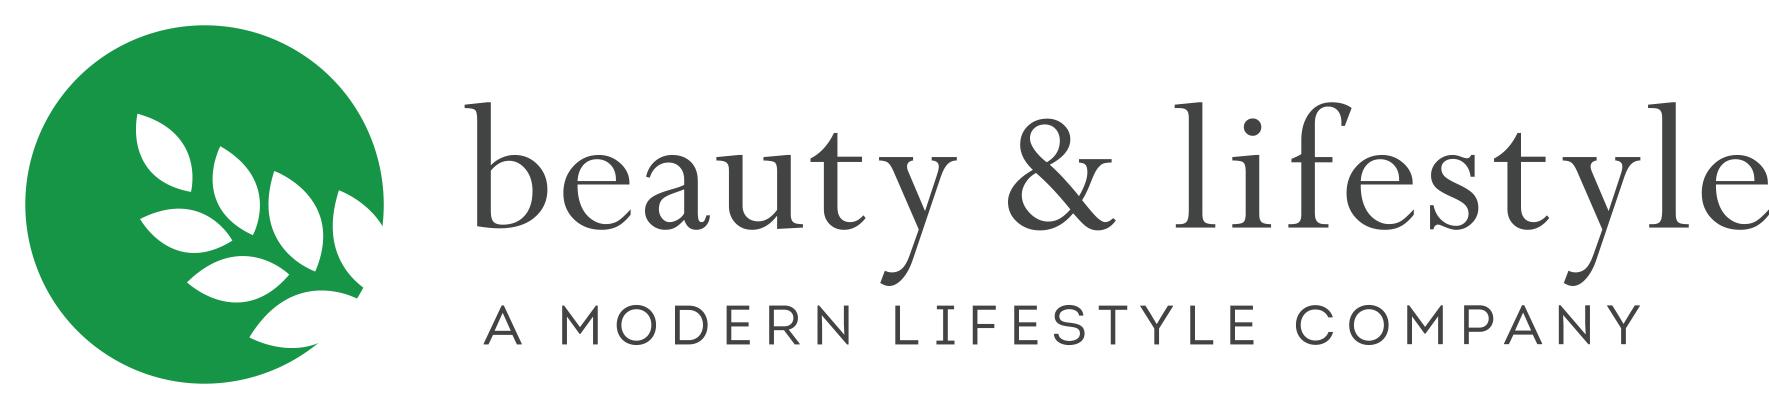 beautyandlifestyle logo